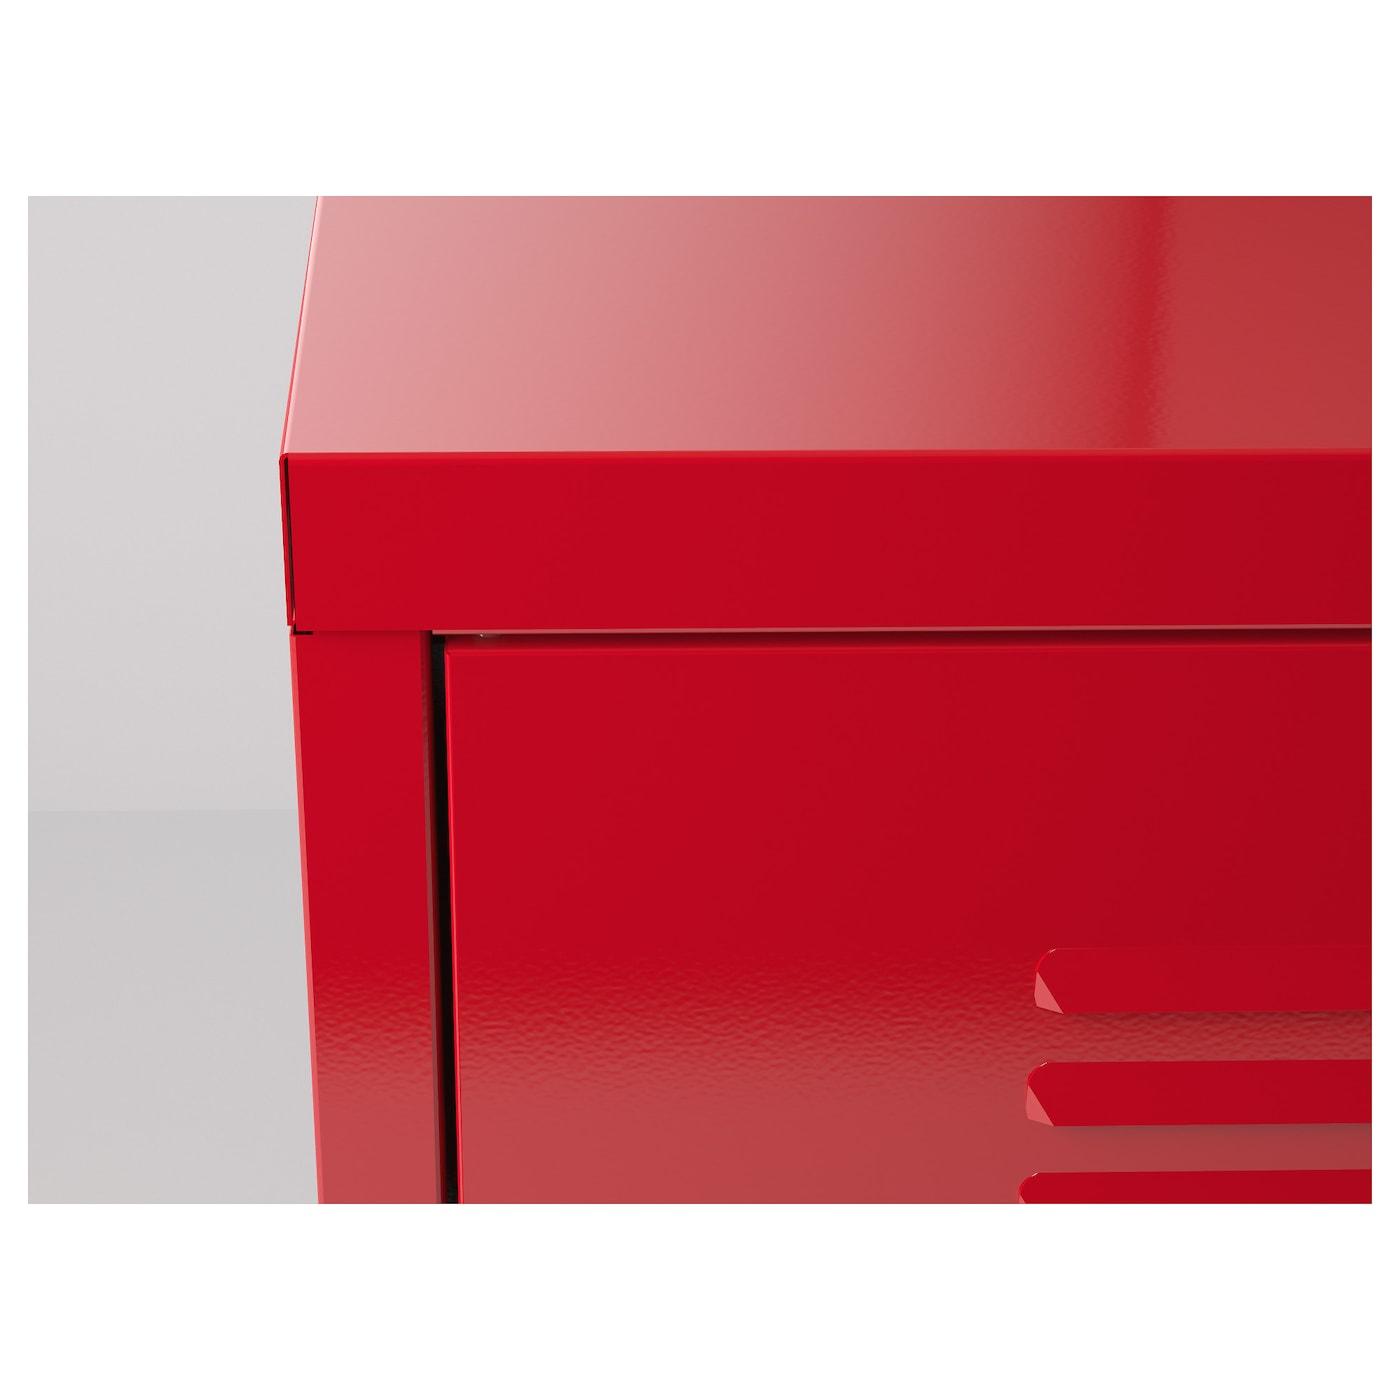 Ikea Ps Armoire M Tallique Rouge 119×63 Cm Ikea # Meuble Tv Ikea Grillage